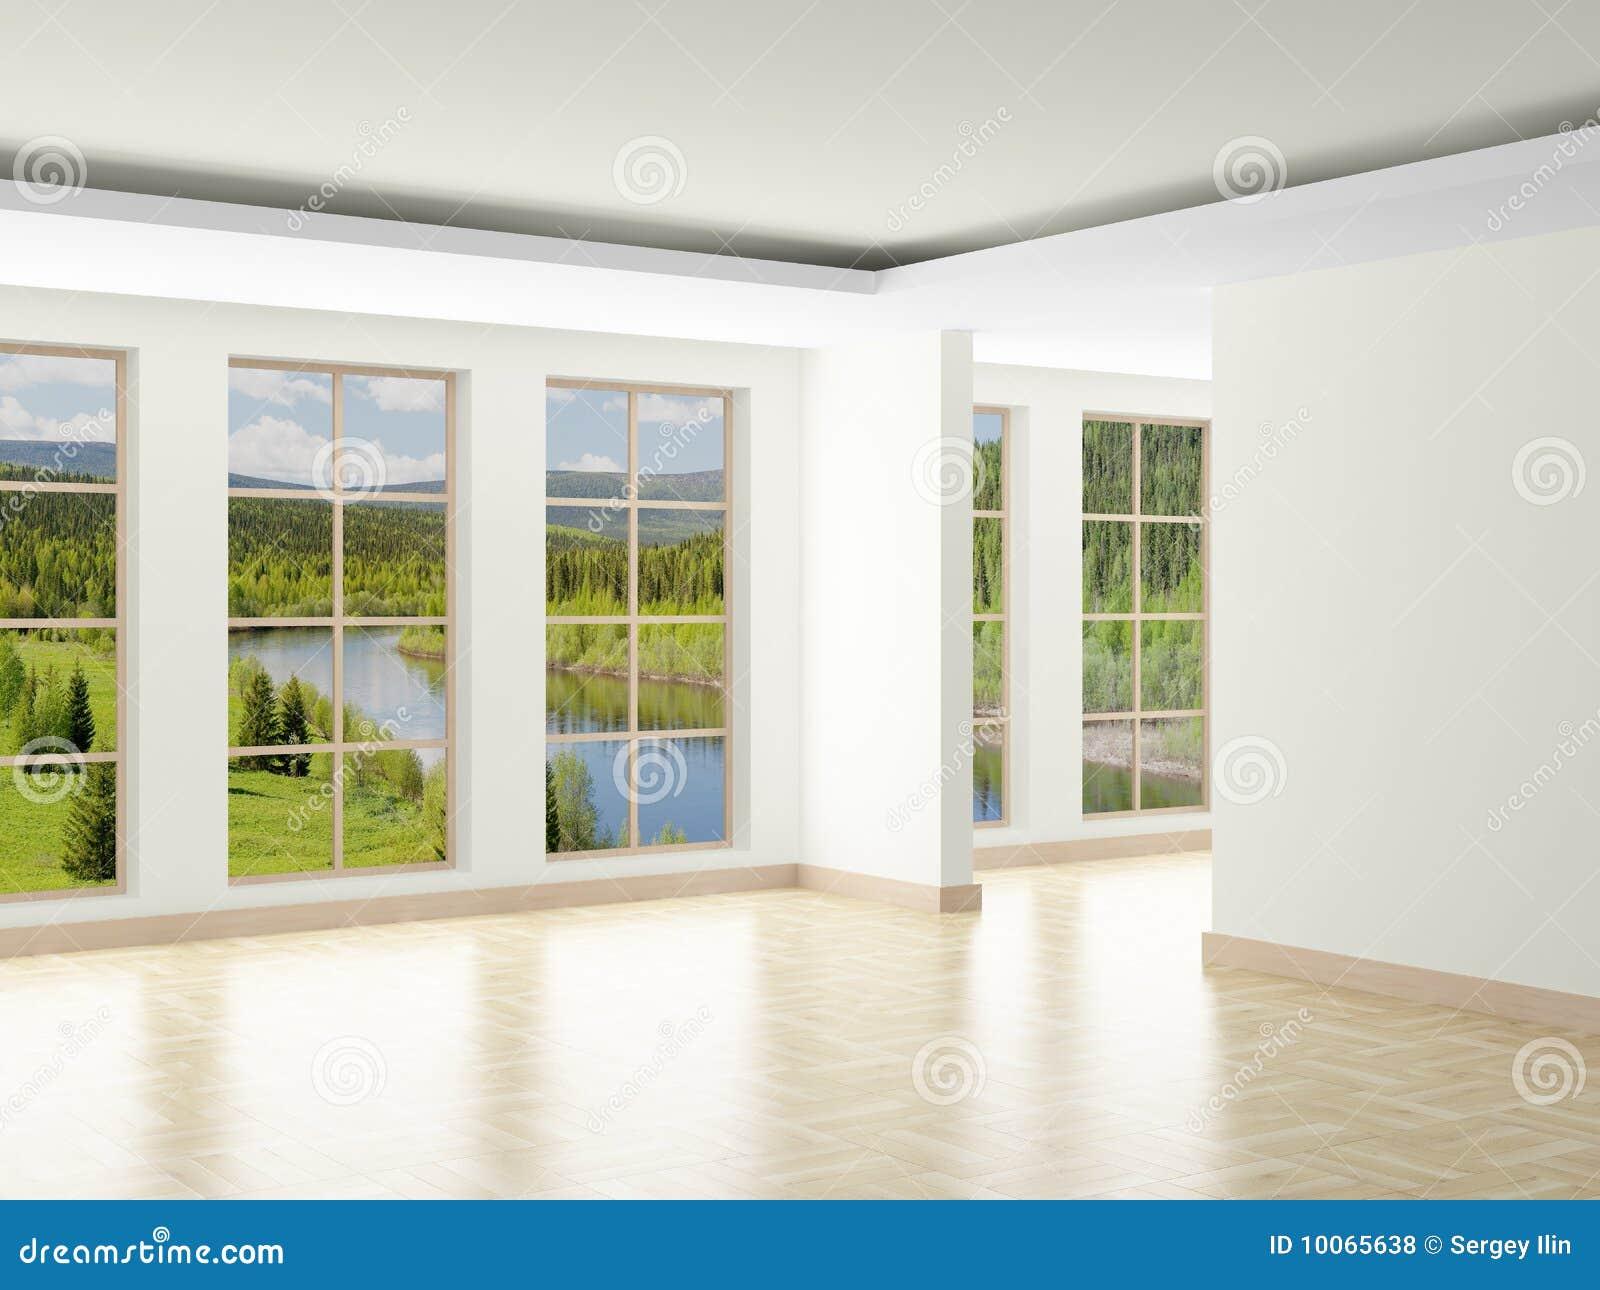 Empty room. Landscape behind window